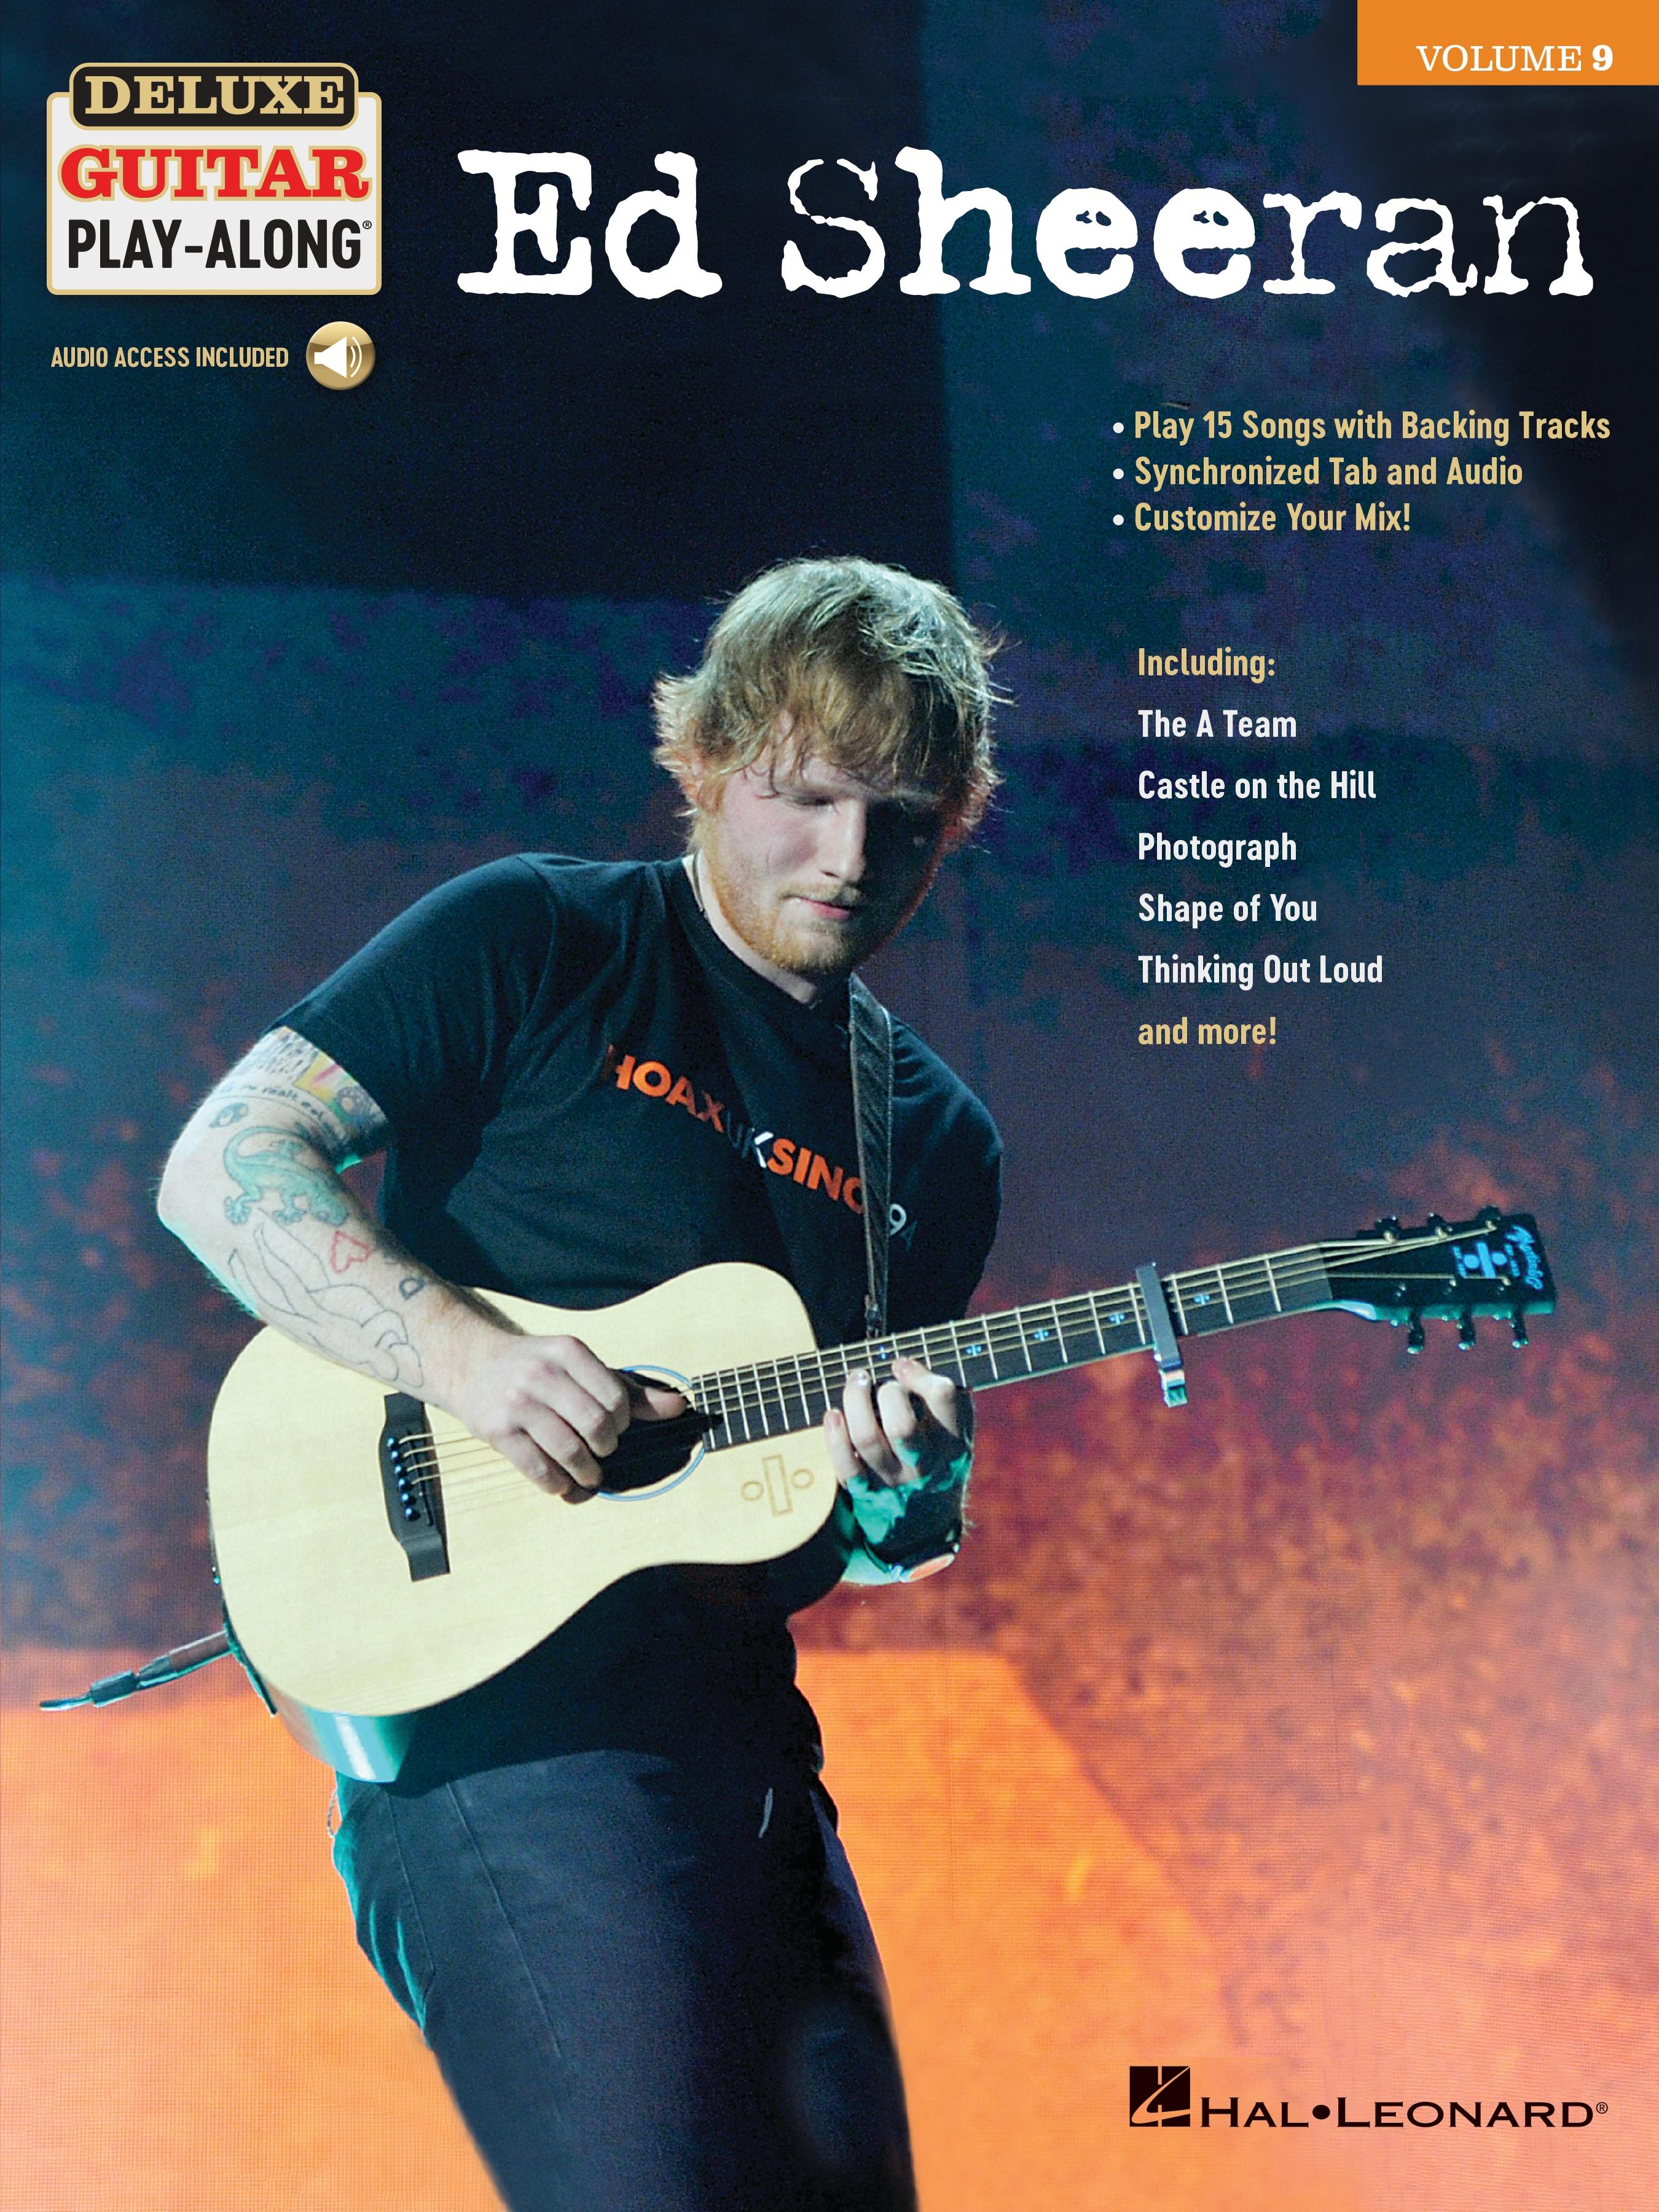 Deluxe Guitar Play-Along, Vol. 9: Ed Sheeran guitar sheet music cover